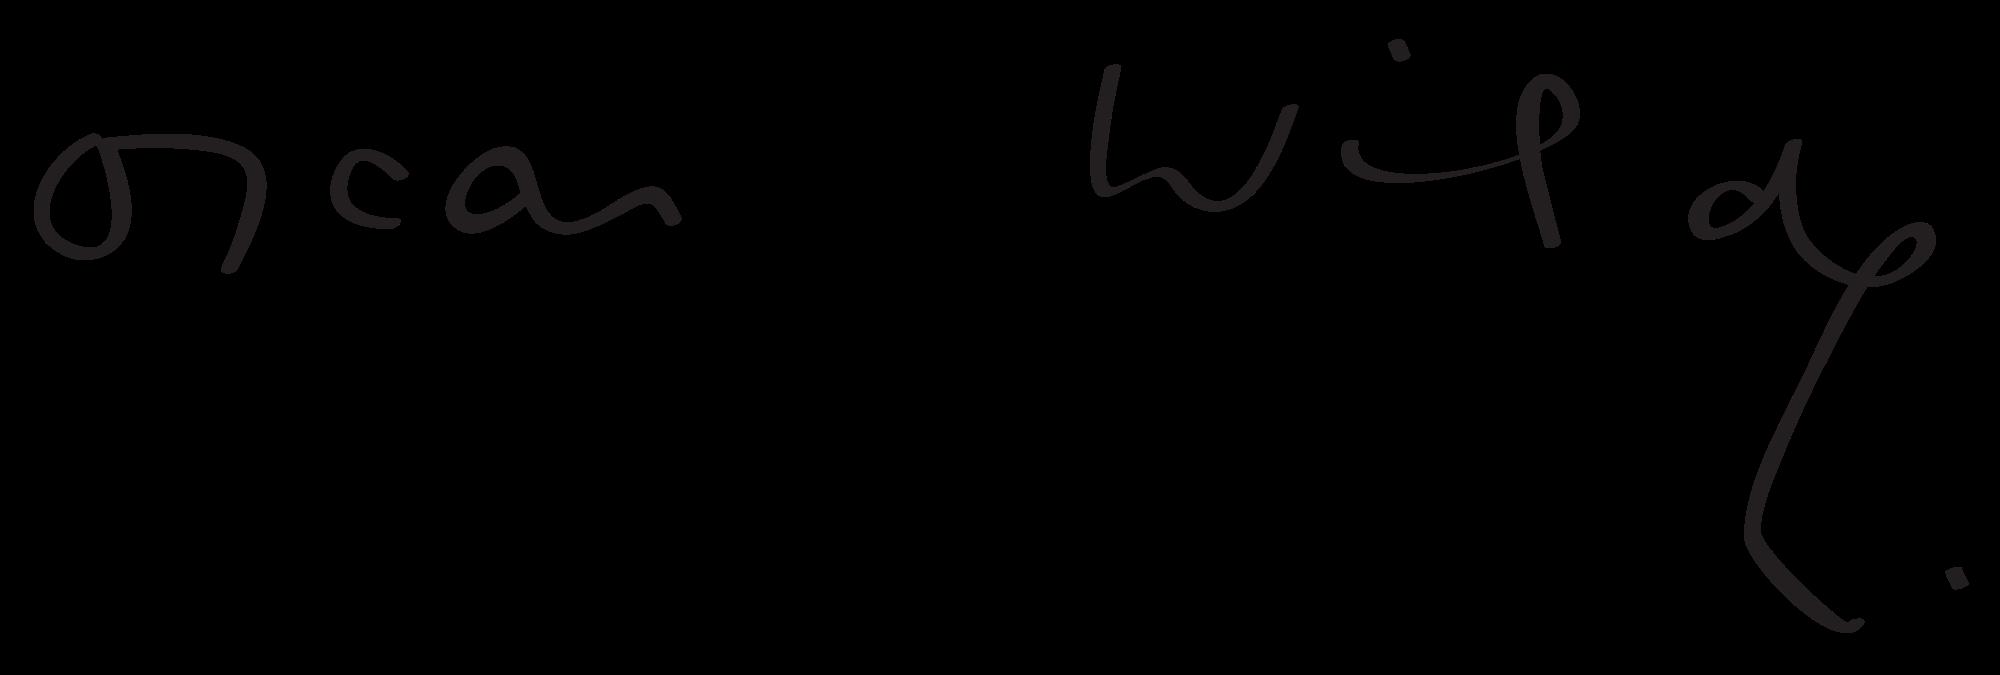 oscar wilde, imza, signture